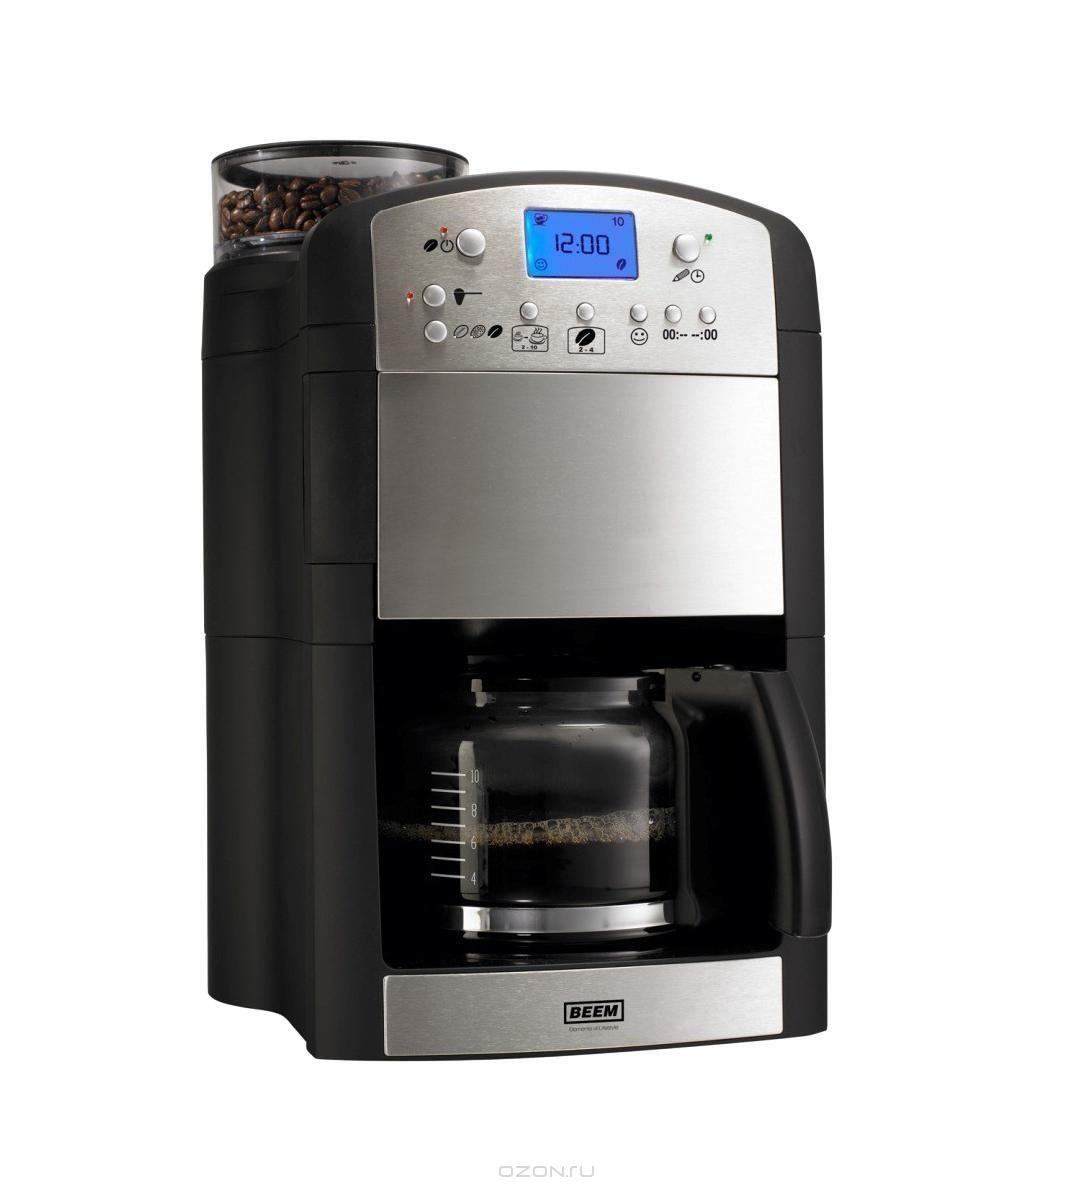 Кофемашина BEEM D2000646